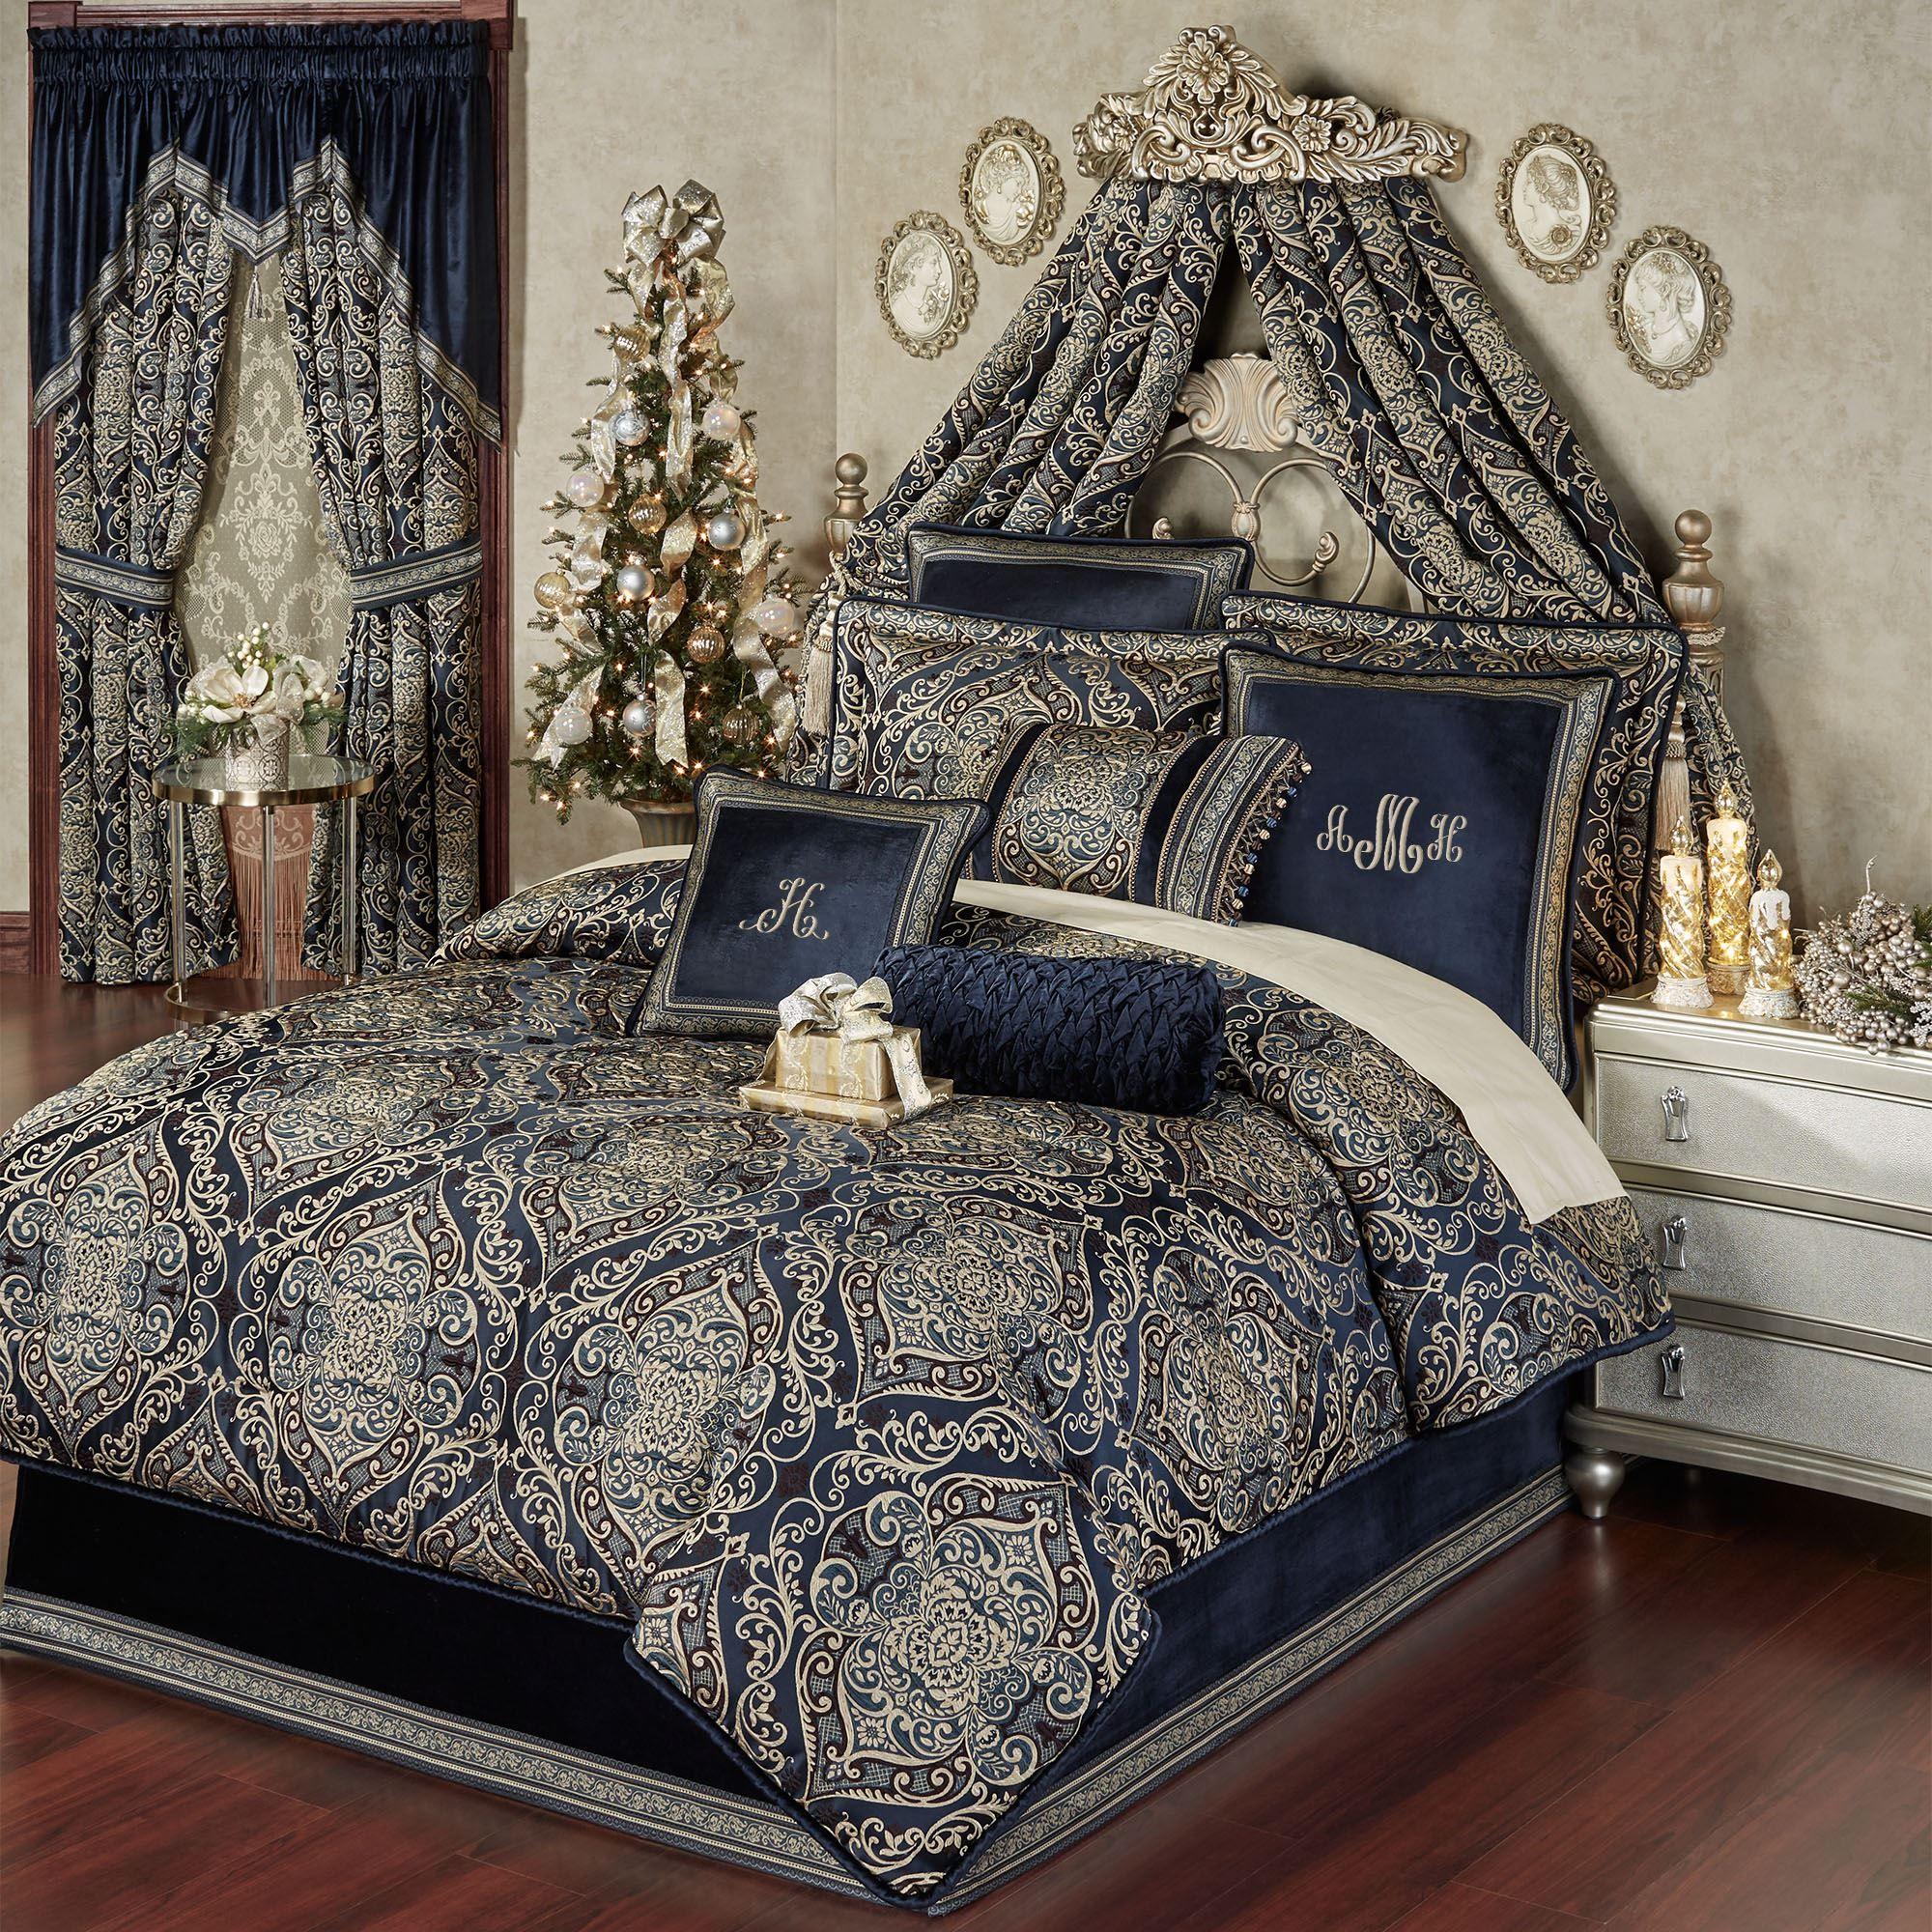 Virtuoso Midnight Damask Comforter Bedding Opulent Bedroom Bed Comforters Comforter Sets